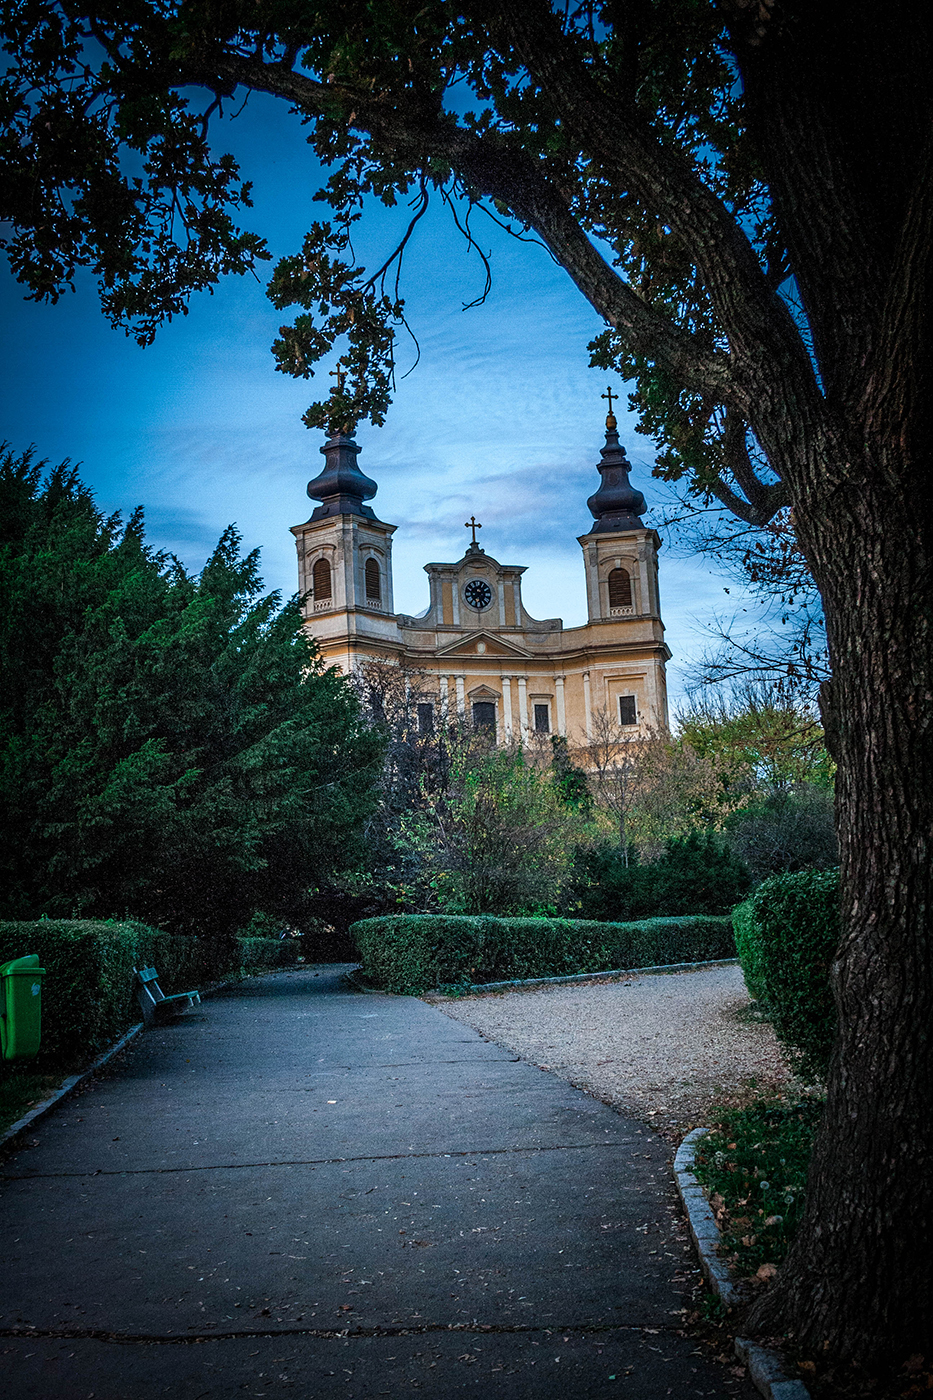 Roman Catholic Basilica from Oradea, Romania